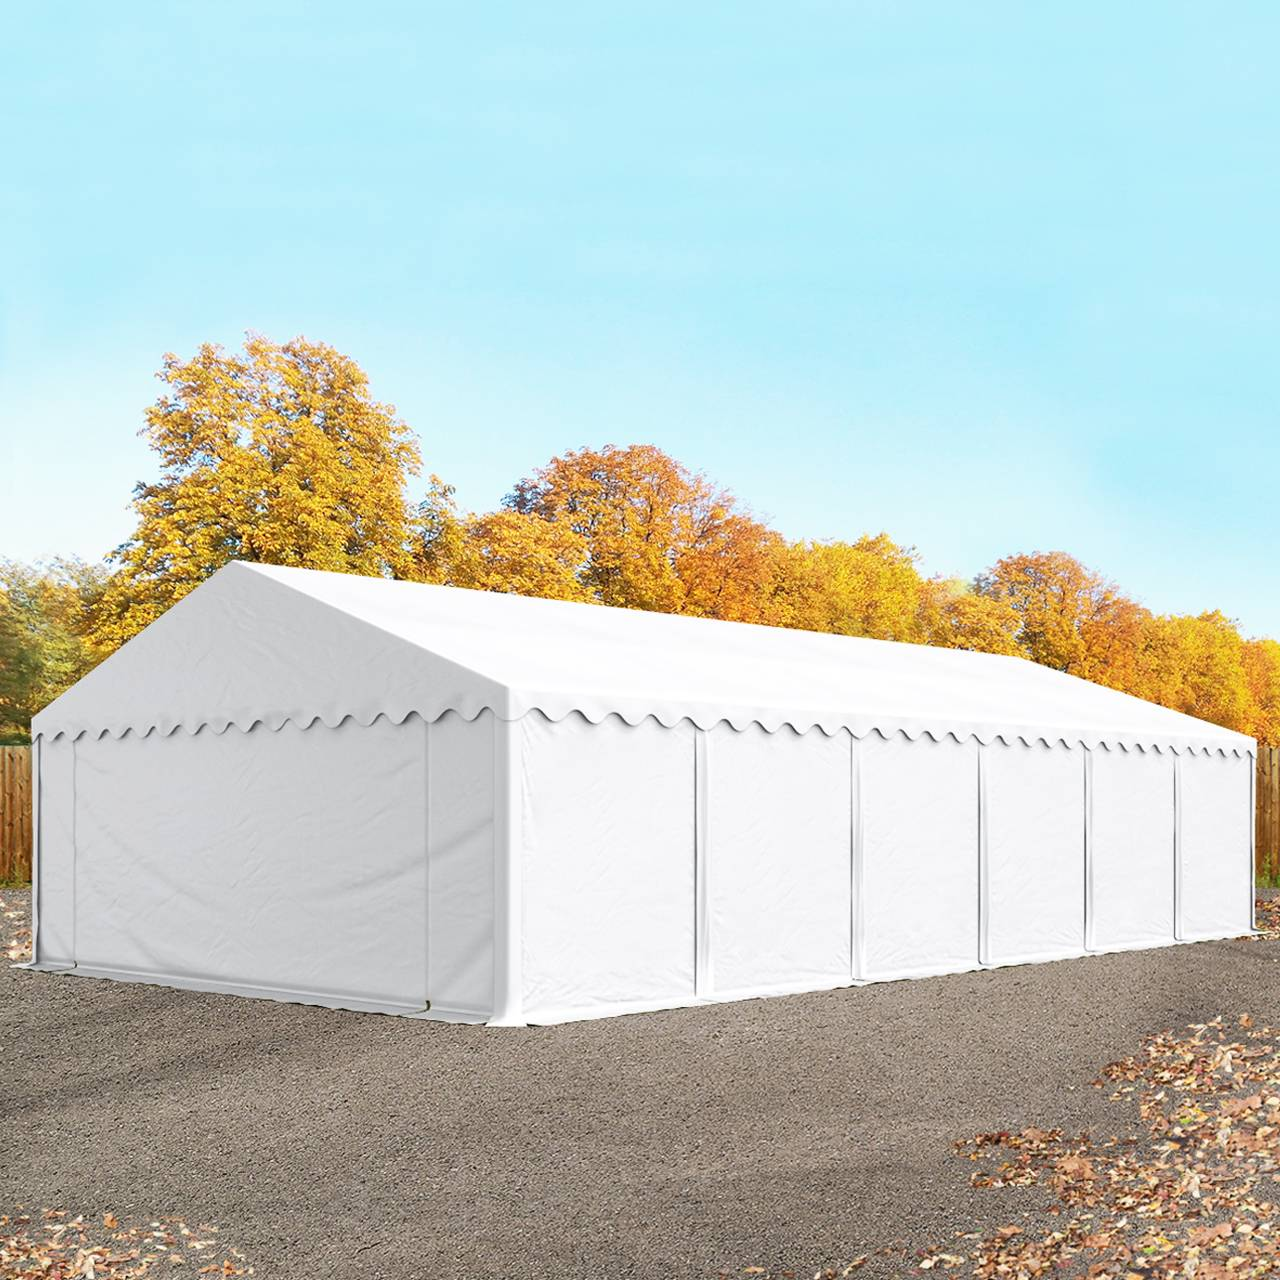 toolport tende capannone 6x12m pvc 500 g/m² bianco sì